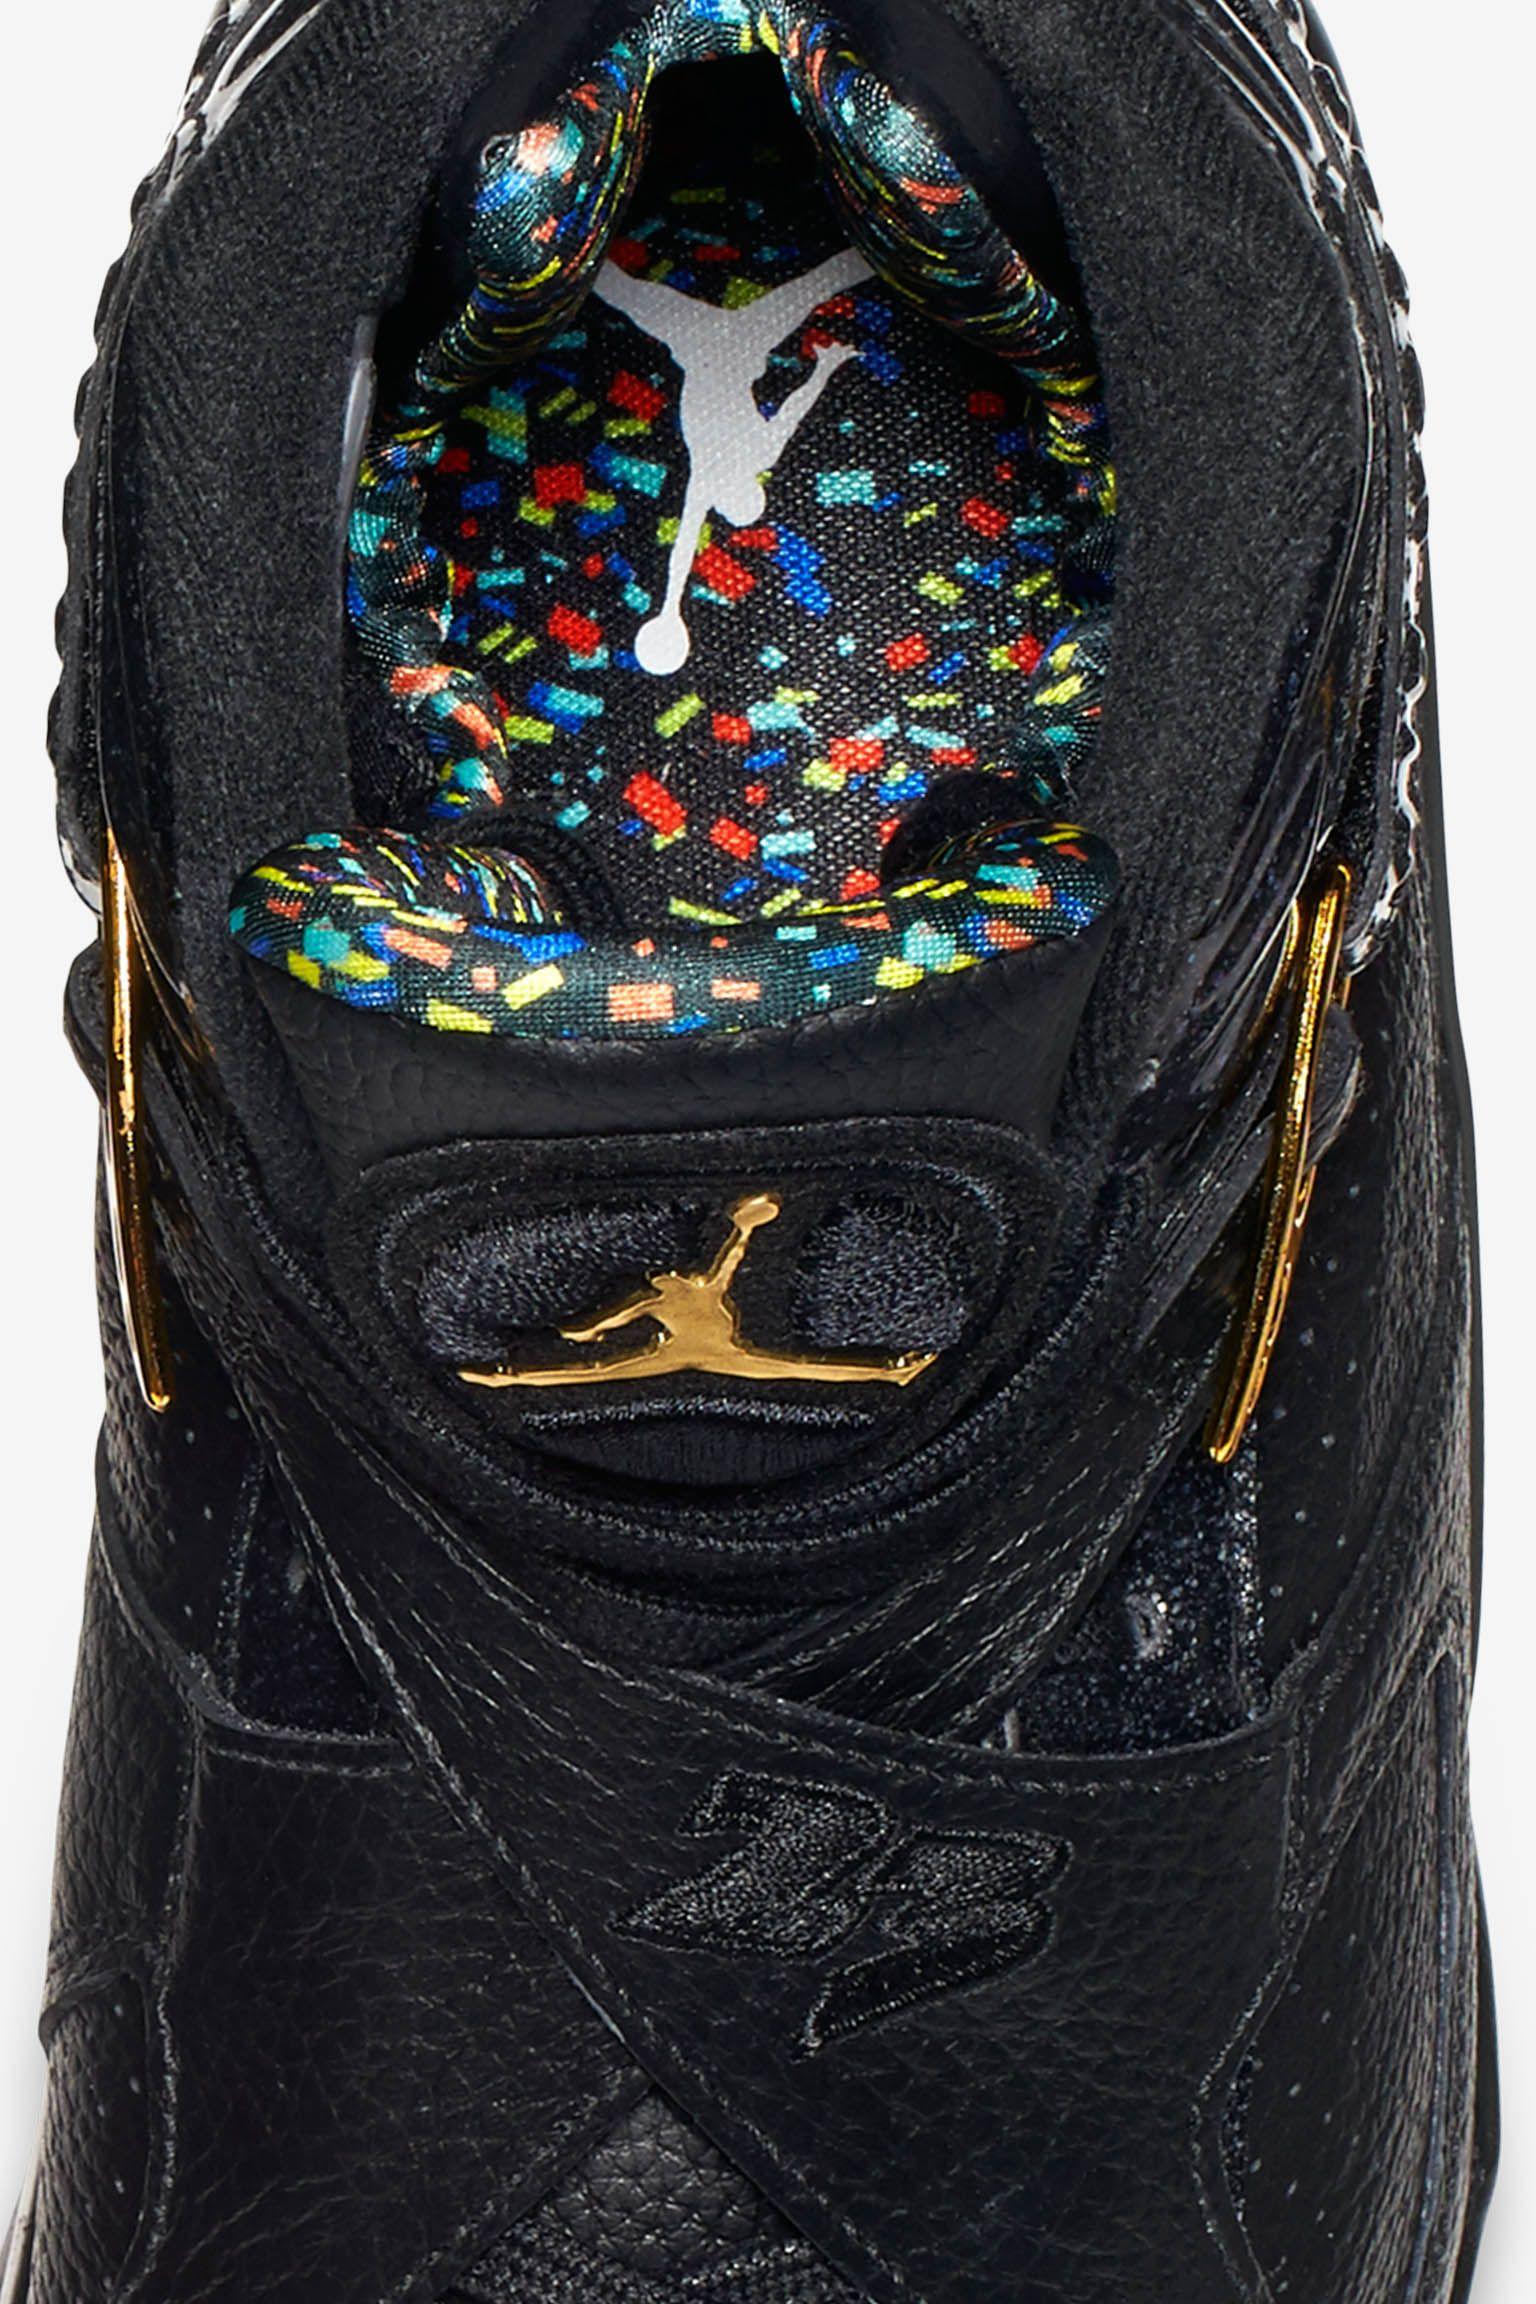 Air Jordan 8 Retro 'Confetti' Release Date